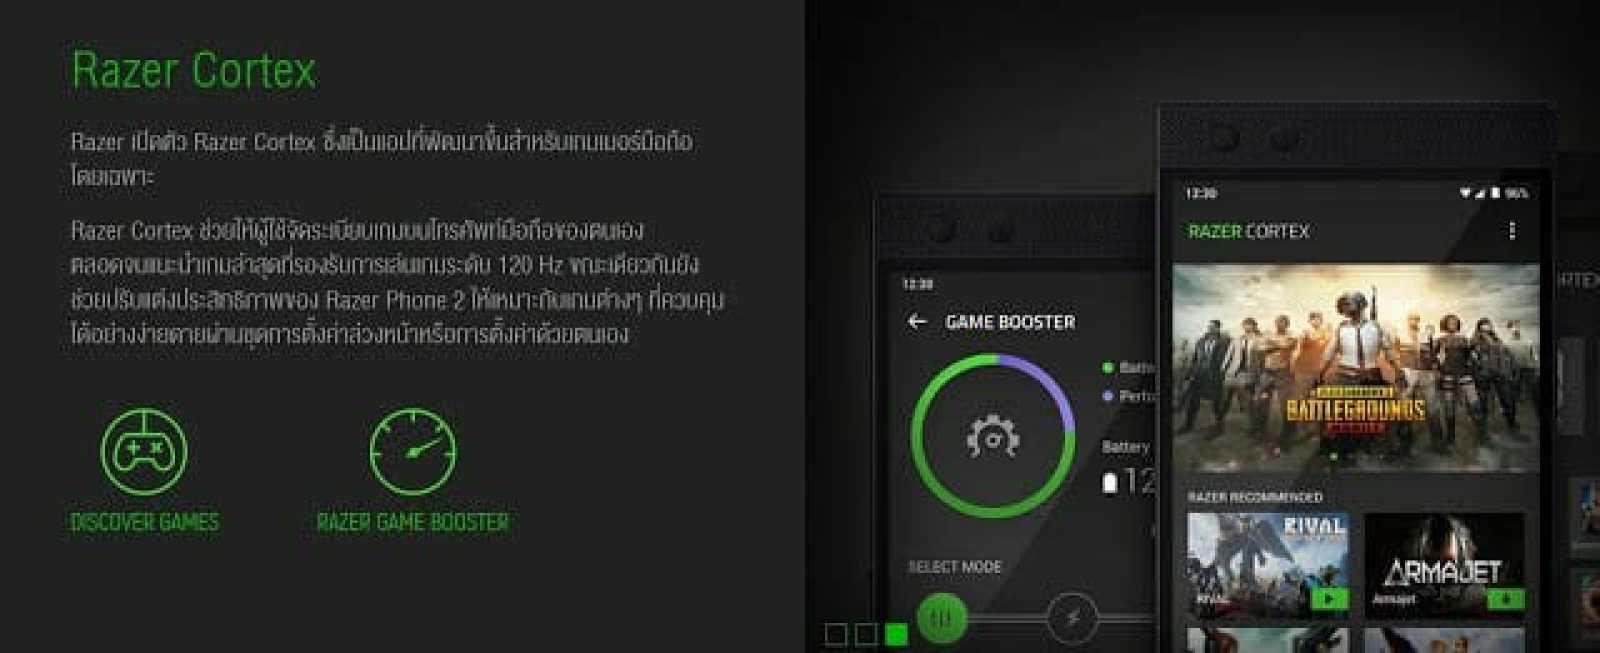 - Screenshot 14 4 - AIS วางจำหน่าย Razer Phone 2 ในไทย ราคา 27,990 บาท